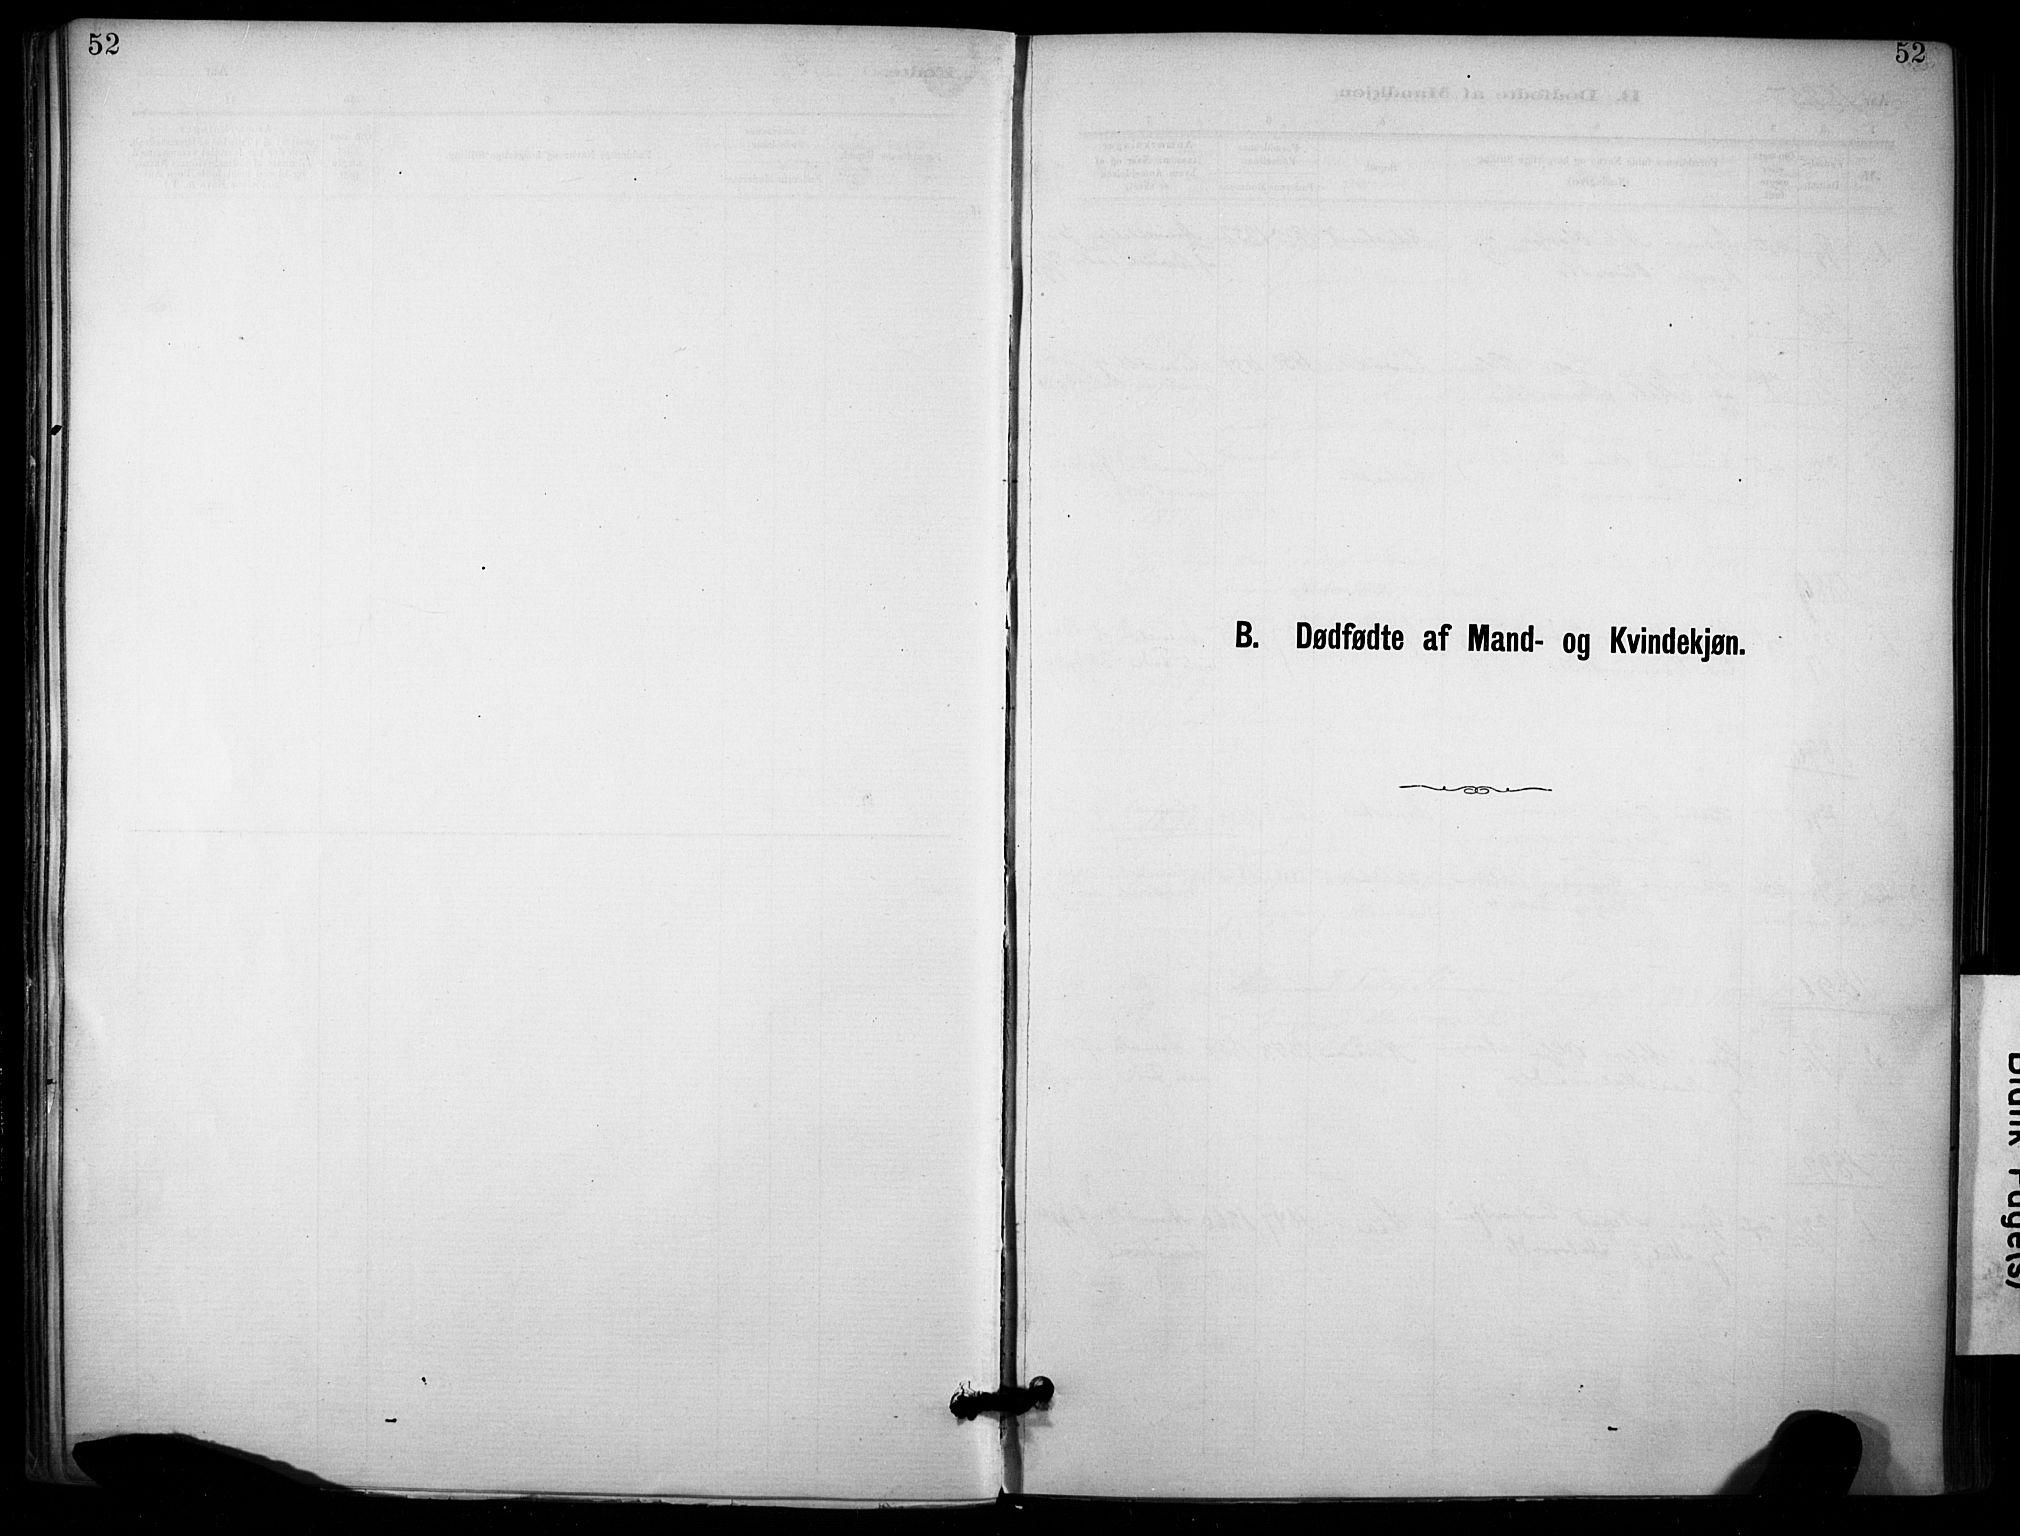 SAKO, Lunde kirkebøker, F/Fa/L0002: Ministerialbok nr. I 2, 1884-1892, s. 52